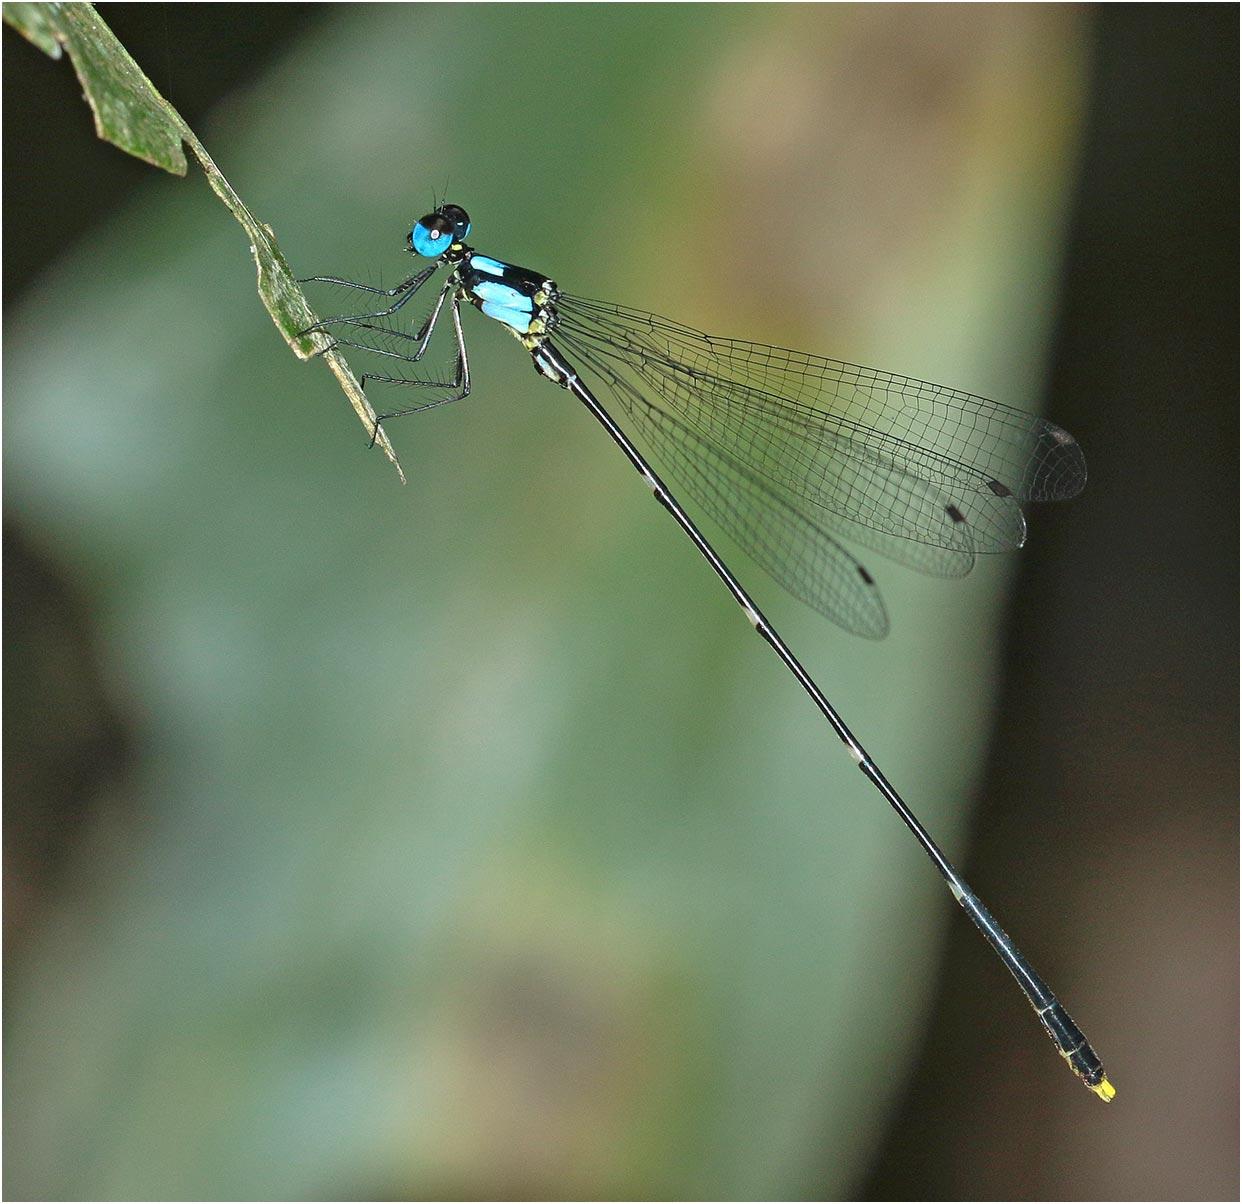 Coeliccia sasamotoi mâle, Vietnam, Xuan Son, 09/06/2018